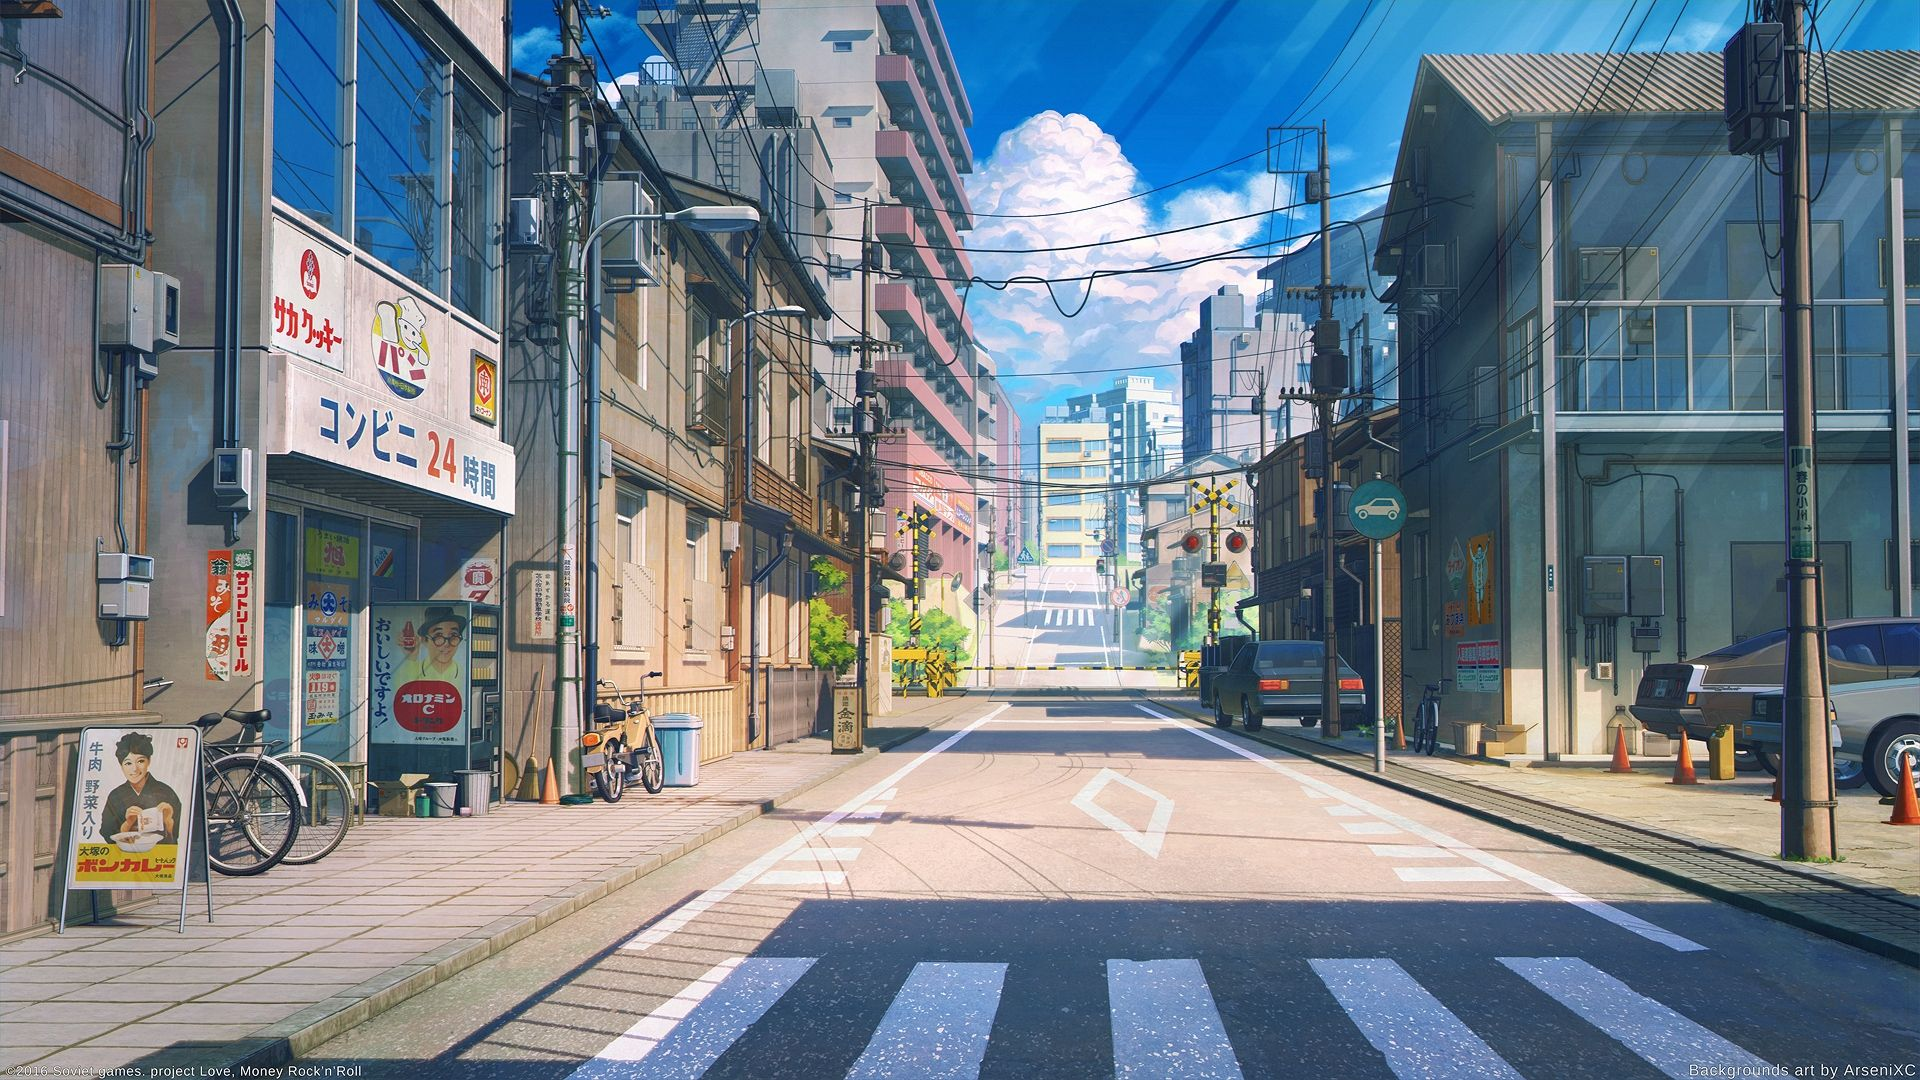 animestreetscenicbuildingsbicyclecarsroadclouds